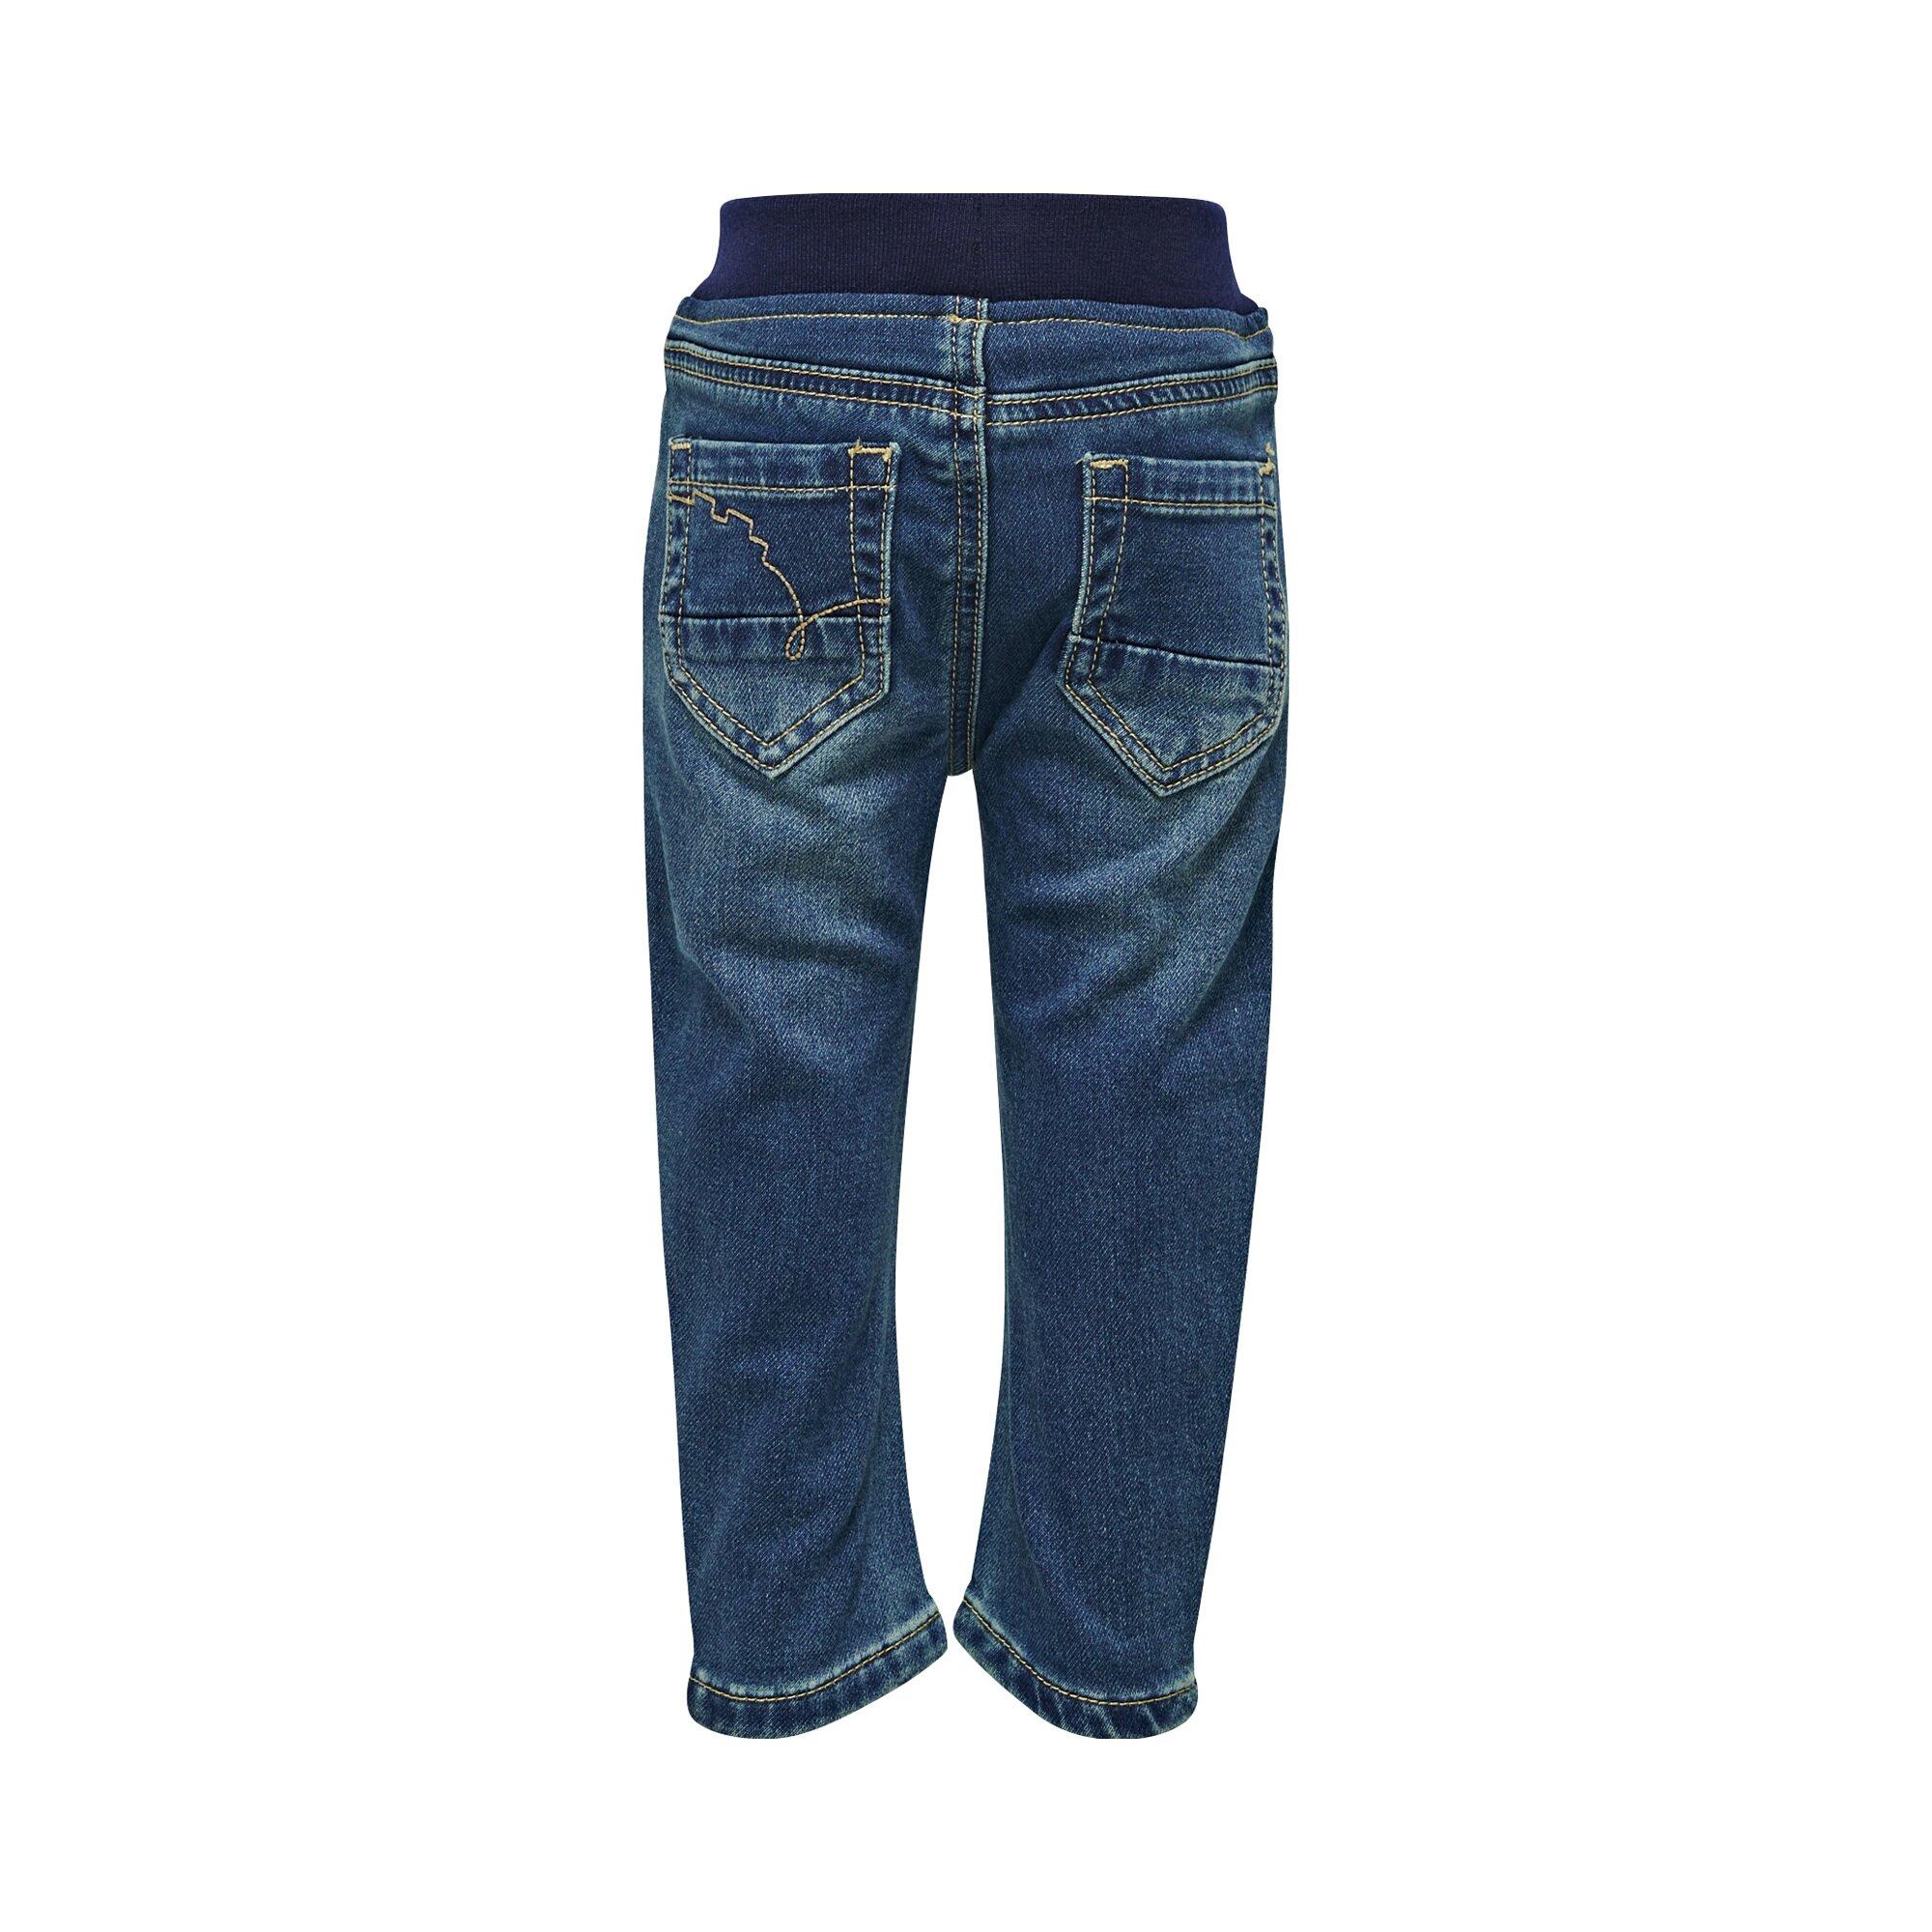 duplo-jogg-jeans-pan-5-pocket